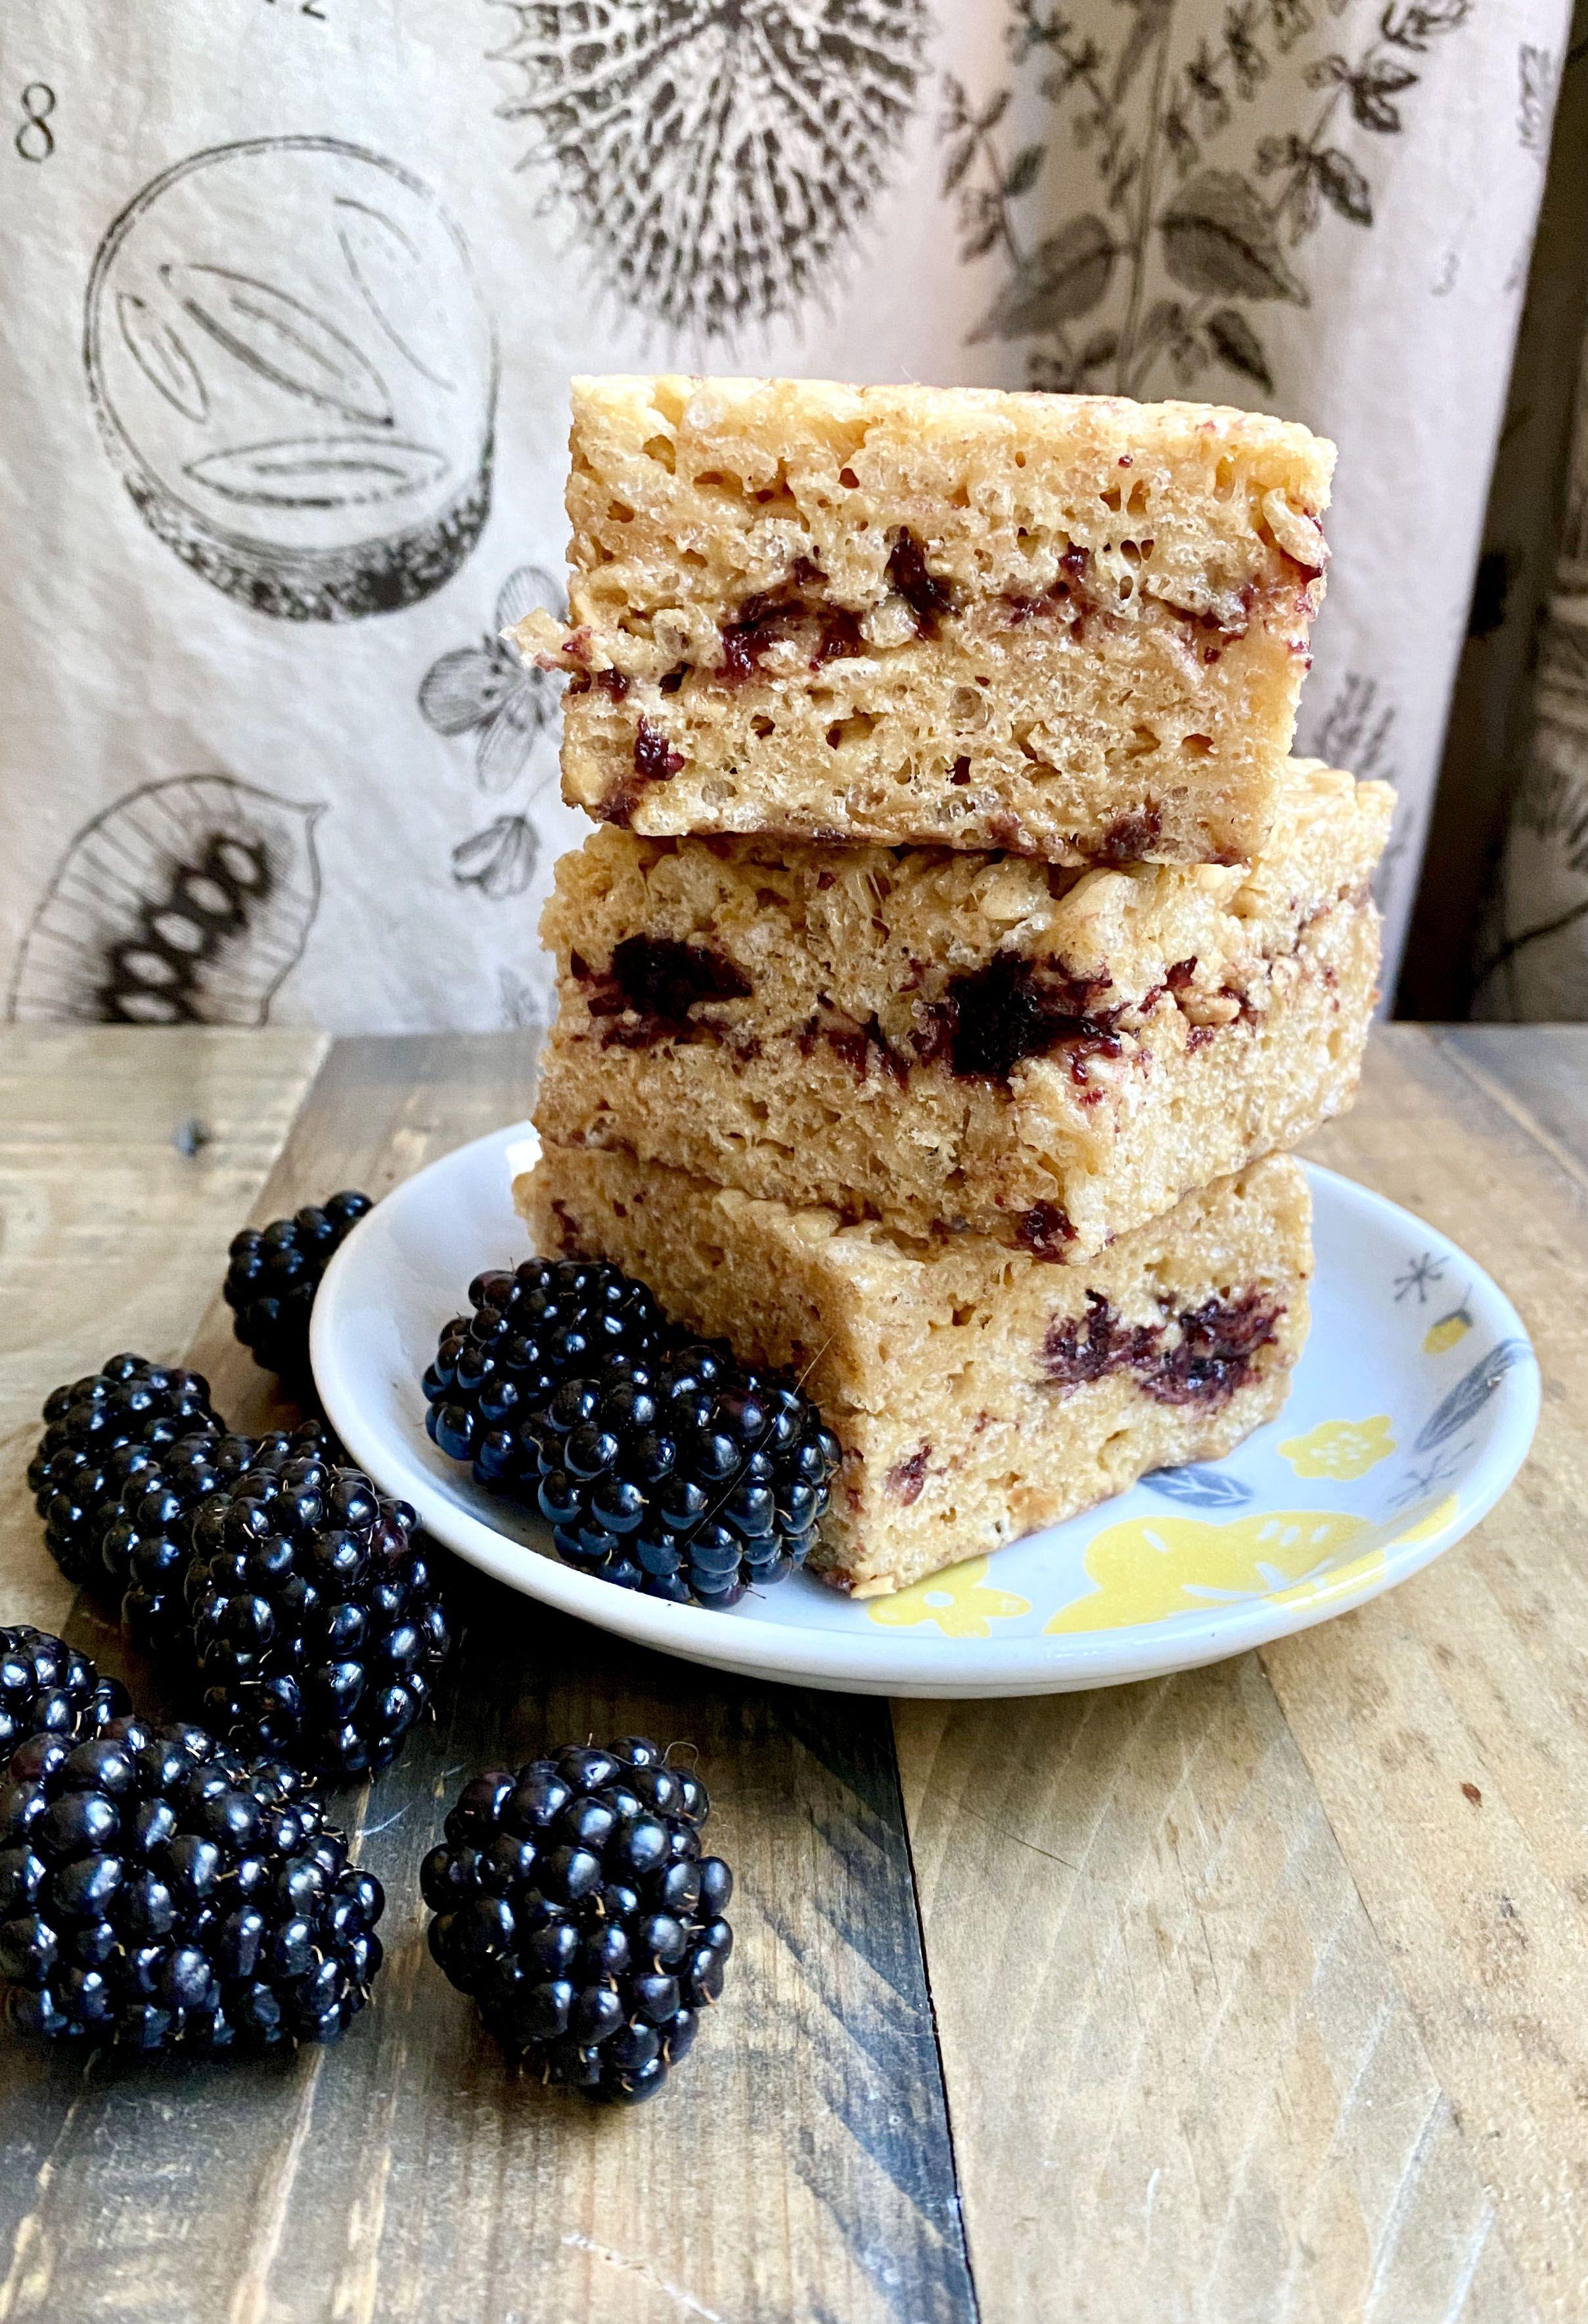 Peanut butter marionberry jam rice krispies treats